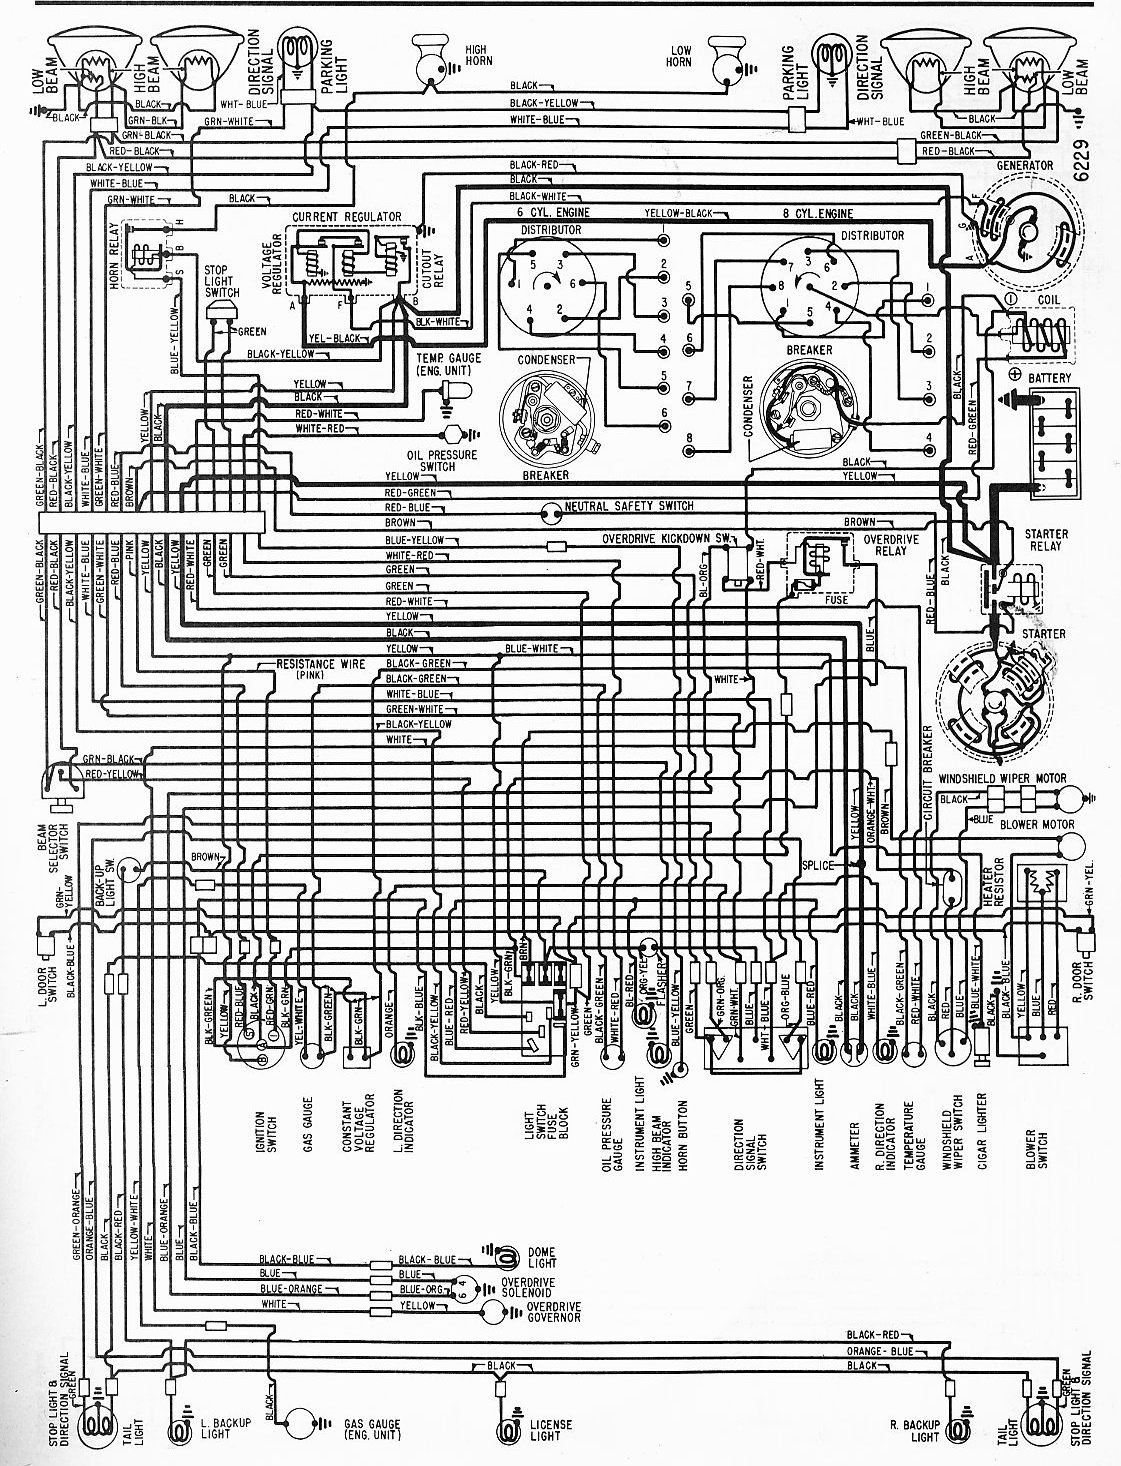 1970 Chevy C10 Fuse Box Diagram Wiring Diagram Portal